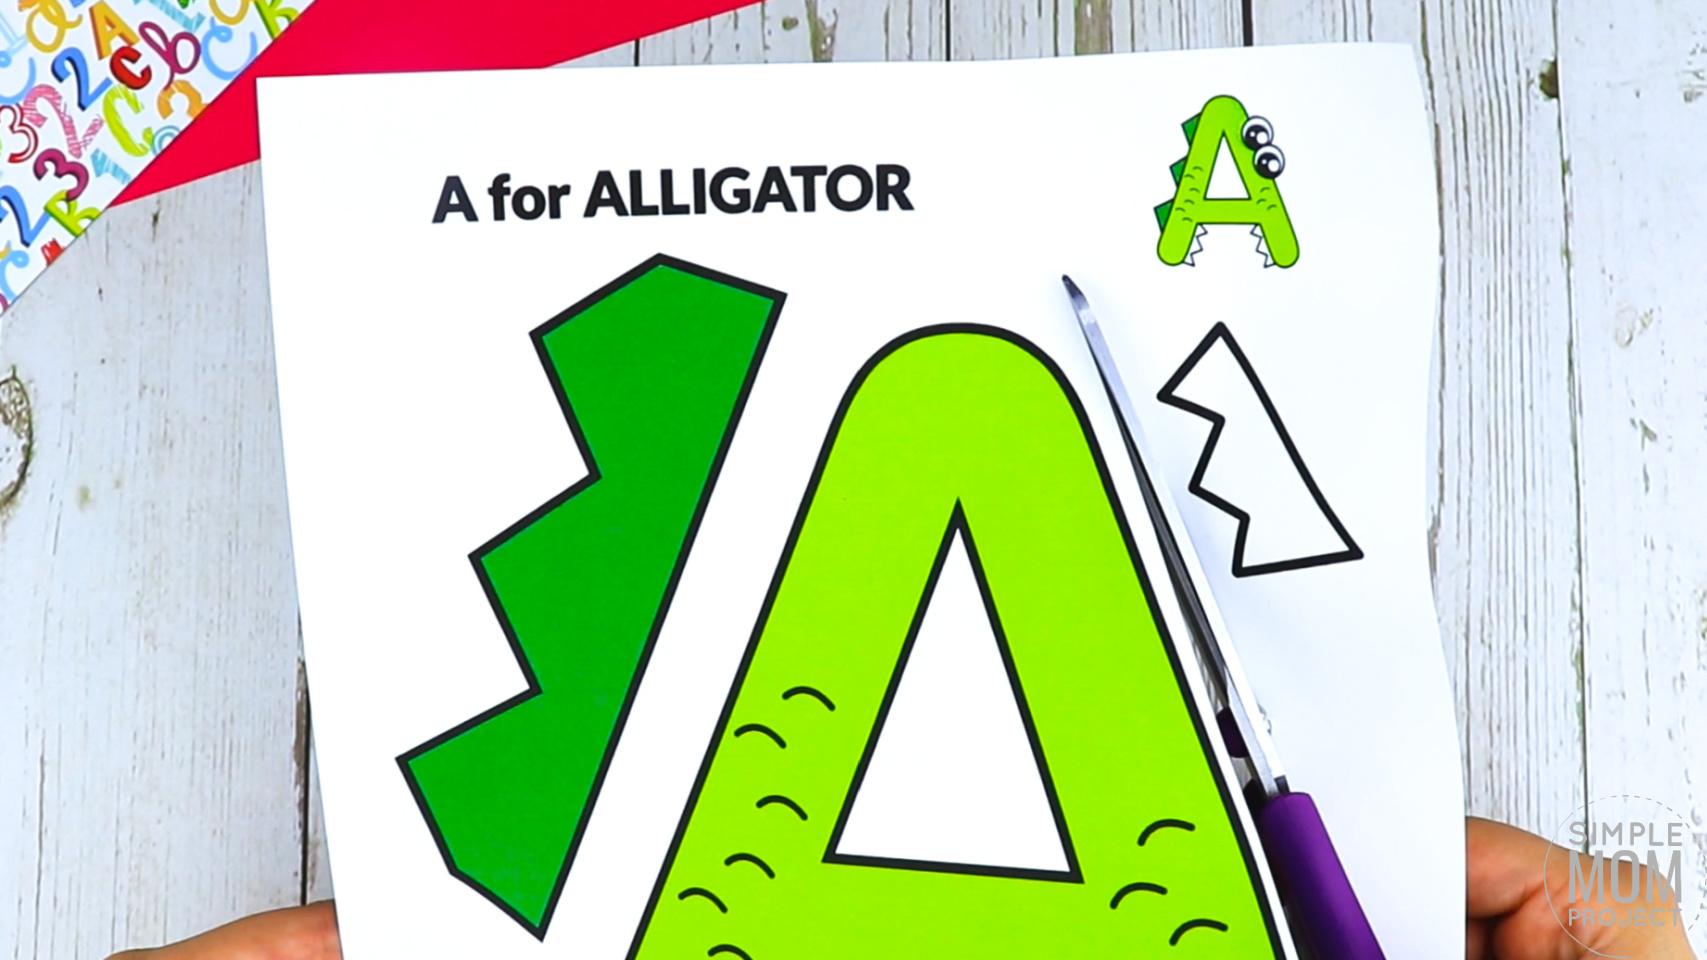 A is for Alligator Free Printable Craft Alligator Letter A Craft for Kids, preschoolers, toddlers and kindergartners